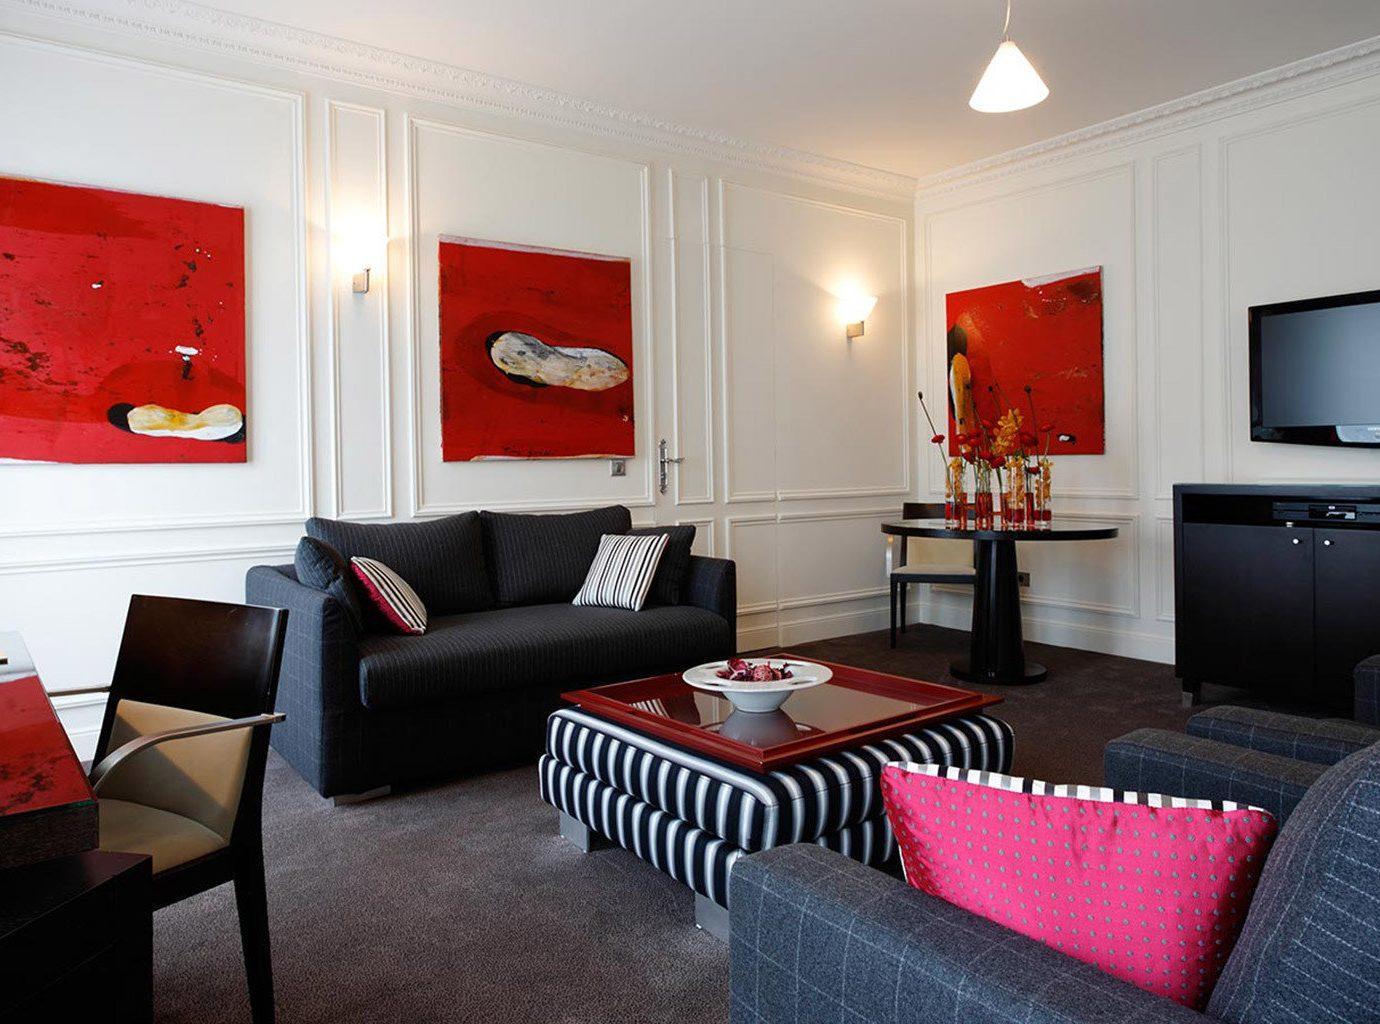 property red living room home Suite cottage flat Bedroom Modern leather